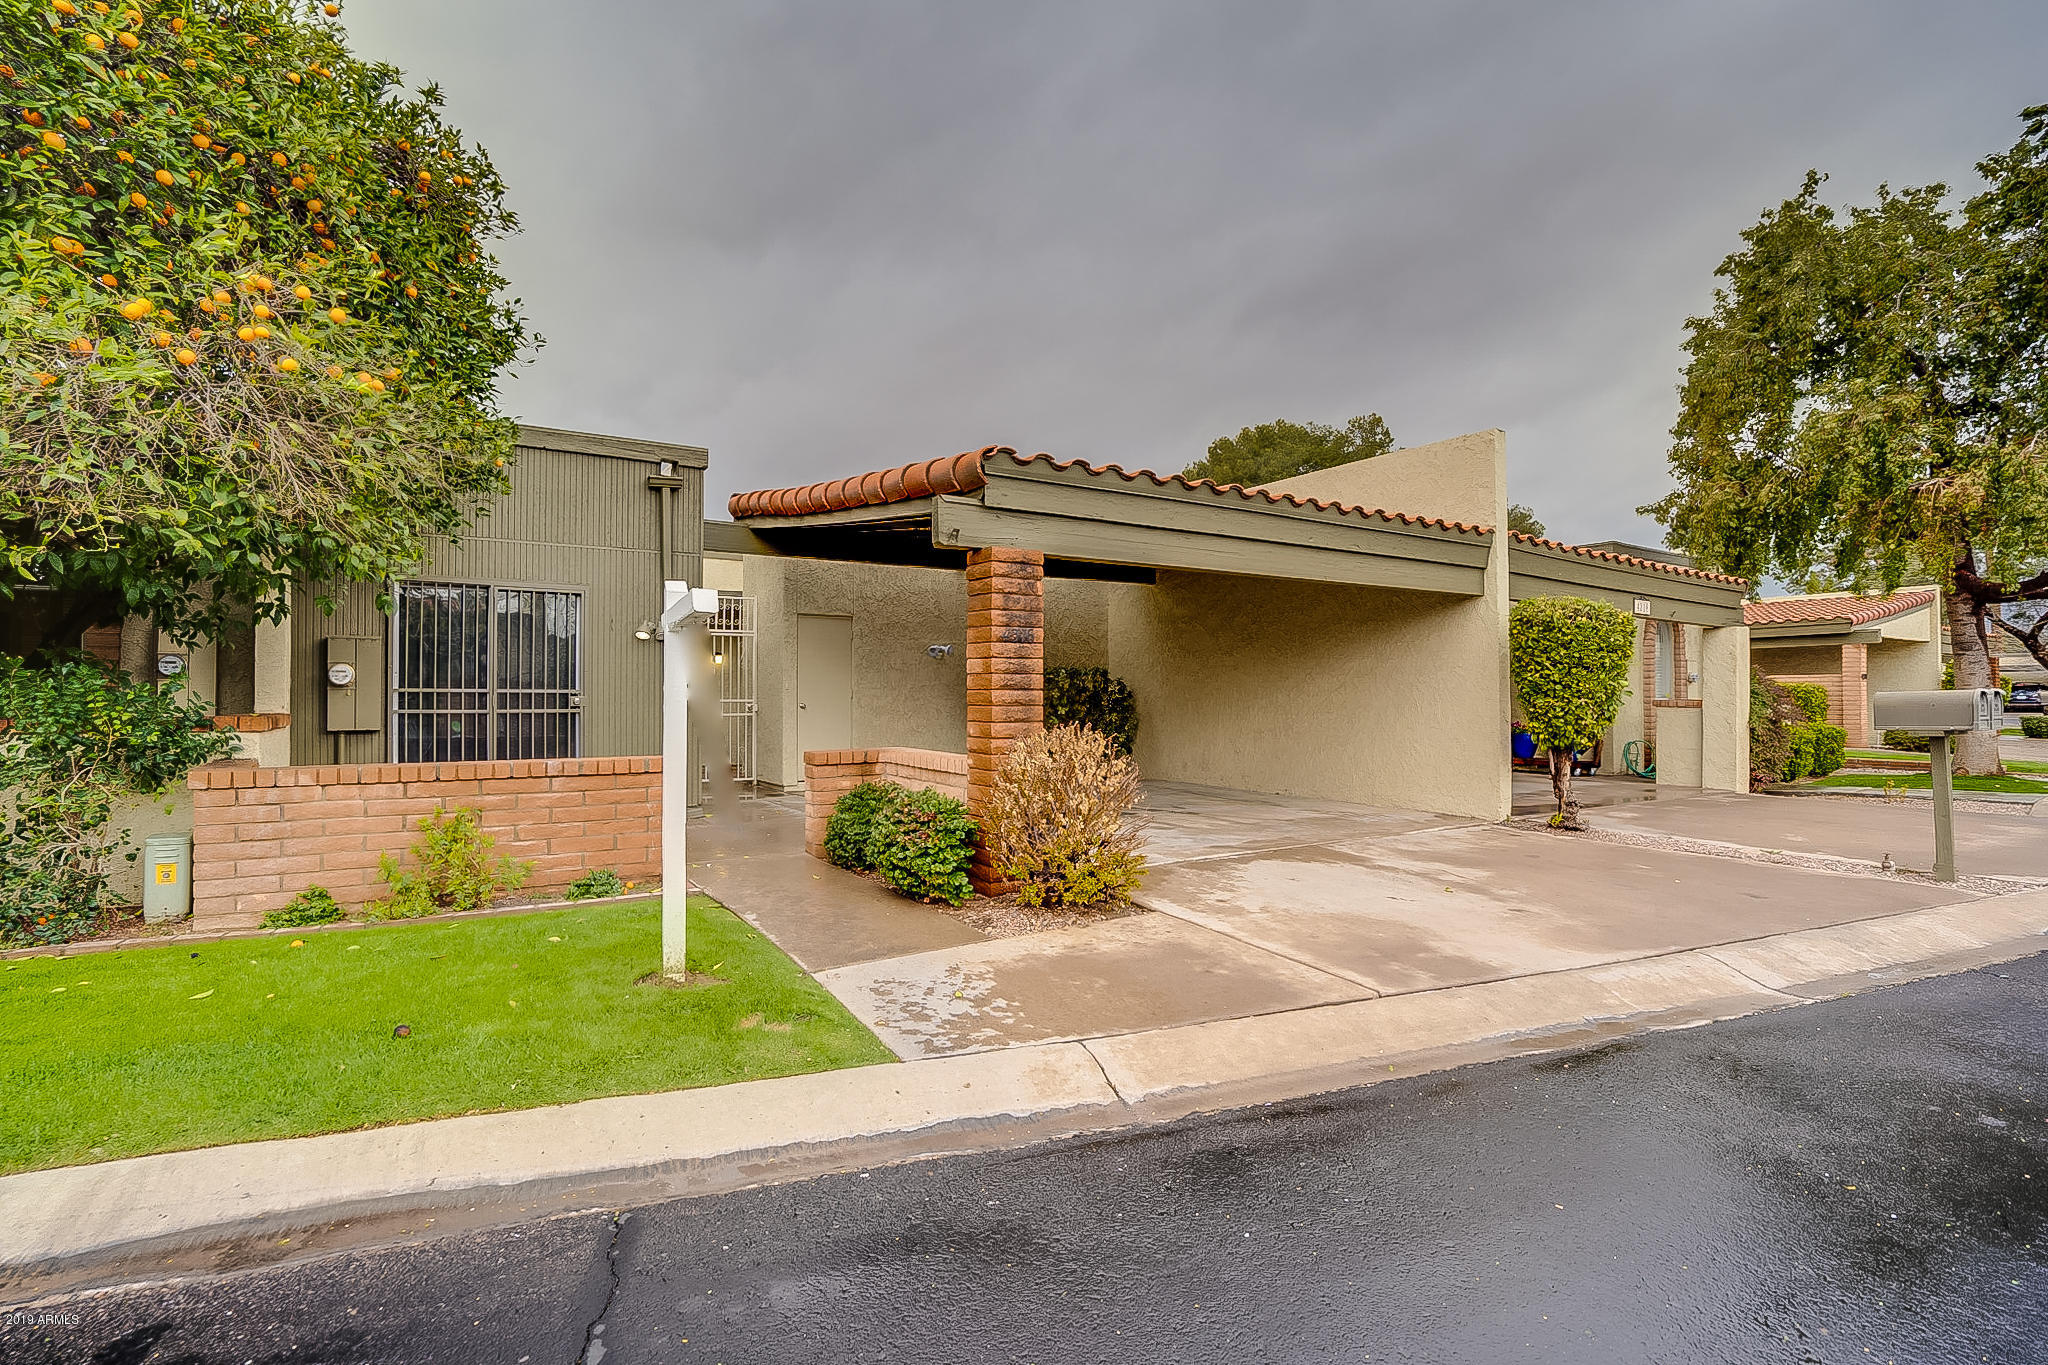 Photo of 4316 N 29TH Place, Phoenix, AZ 85016